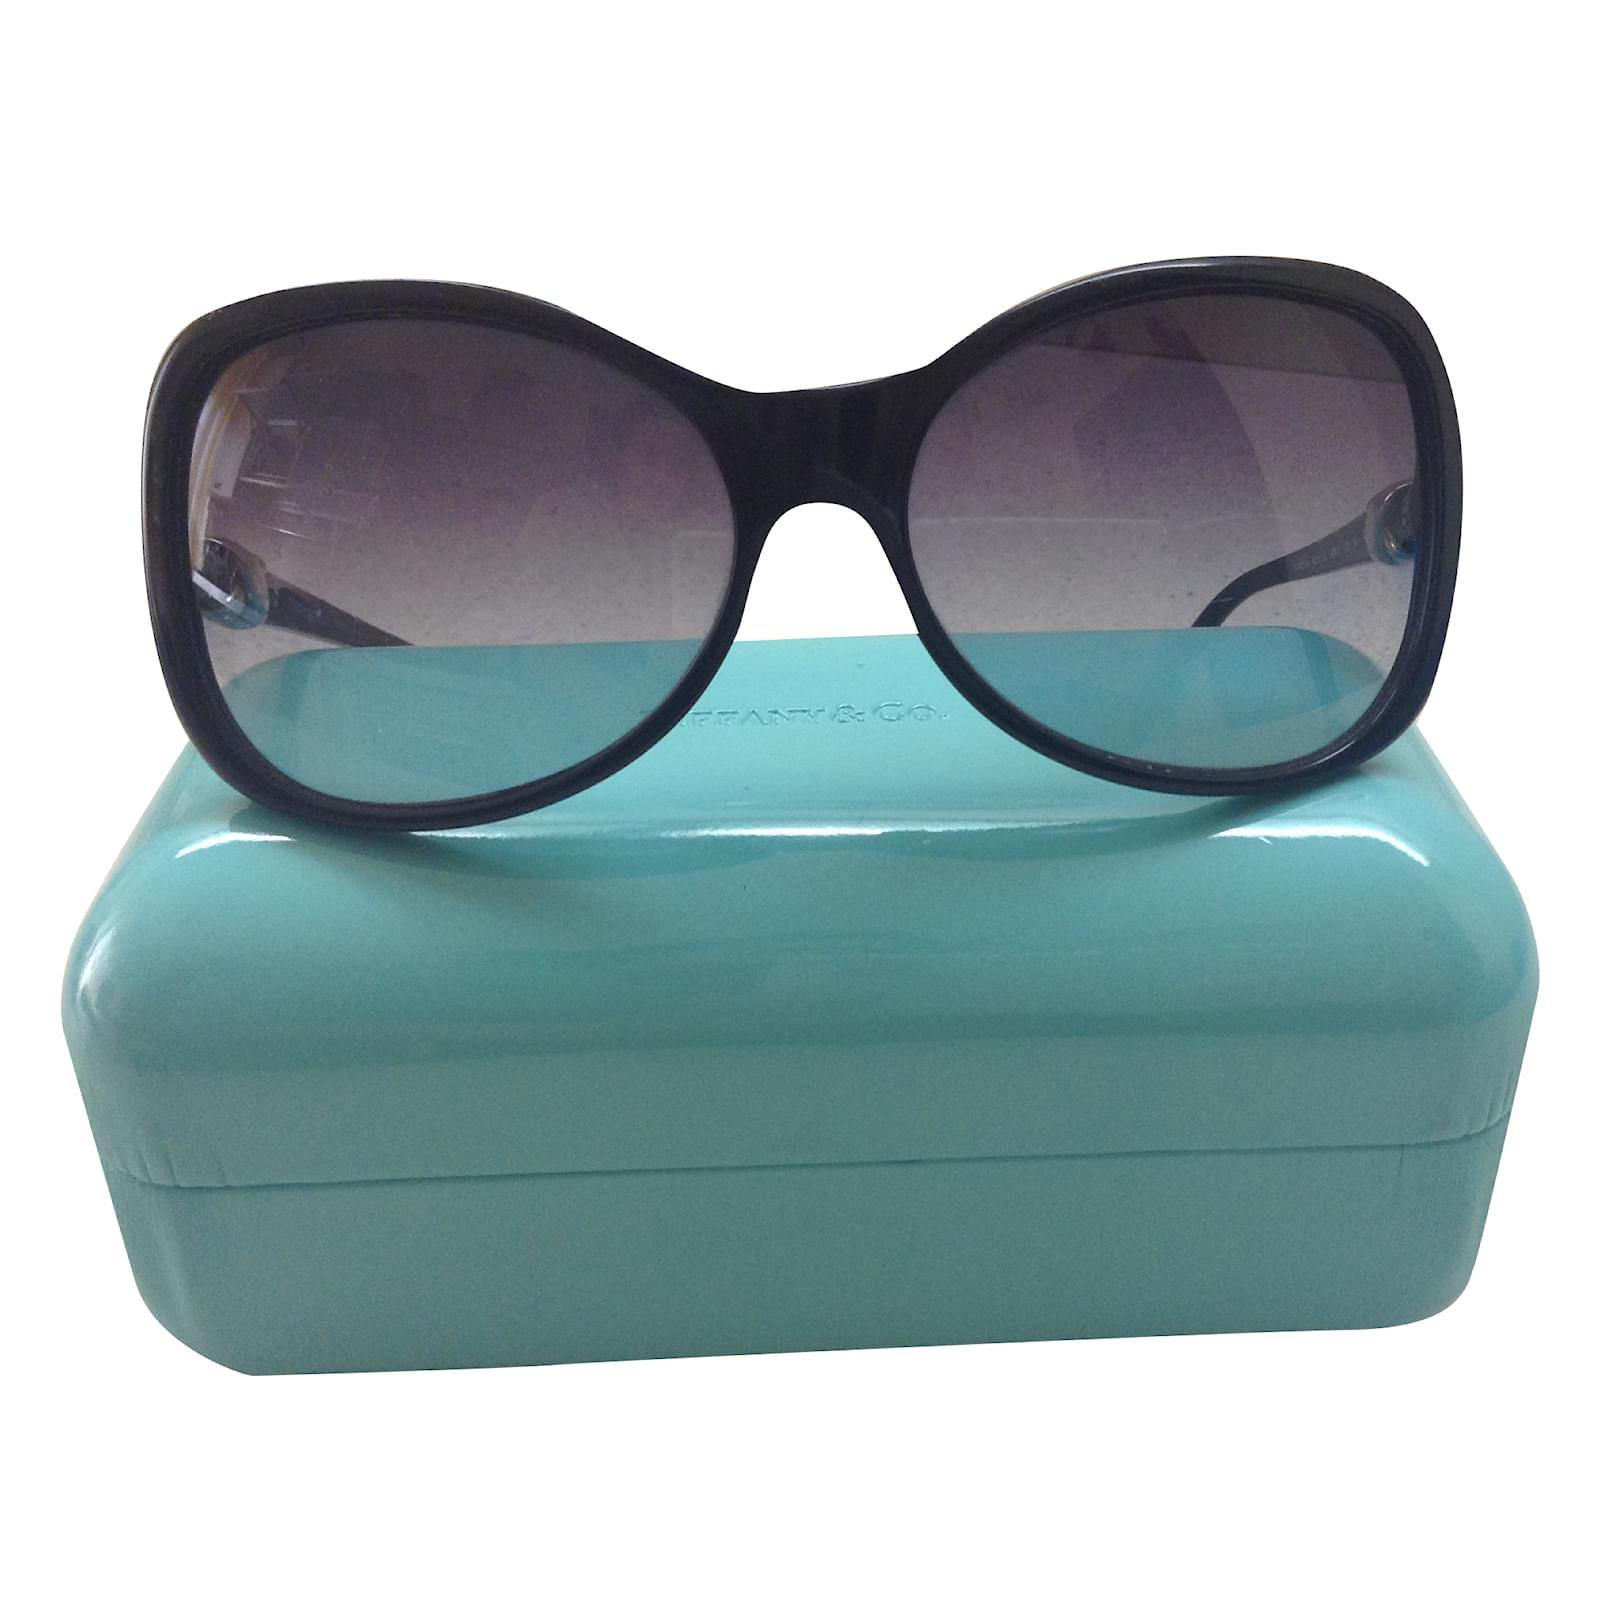 488ec877e0 Tiffany & Co Sunglasses Sunglasses Plastic Black ref.34015 - Joli Closet